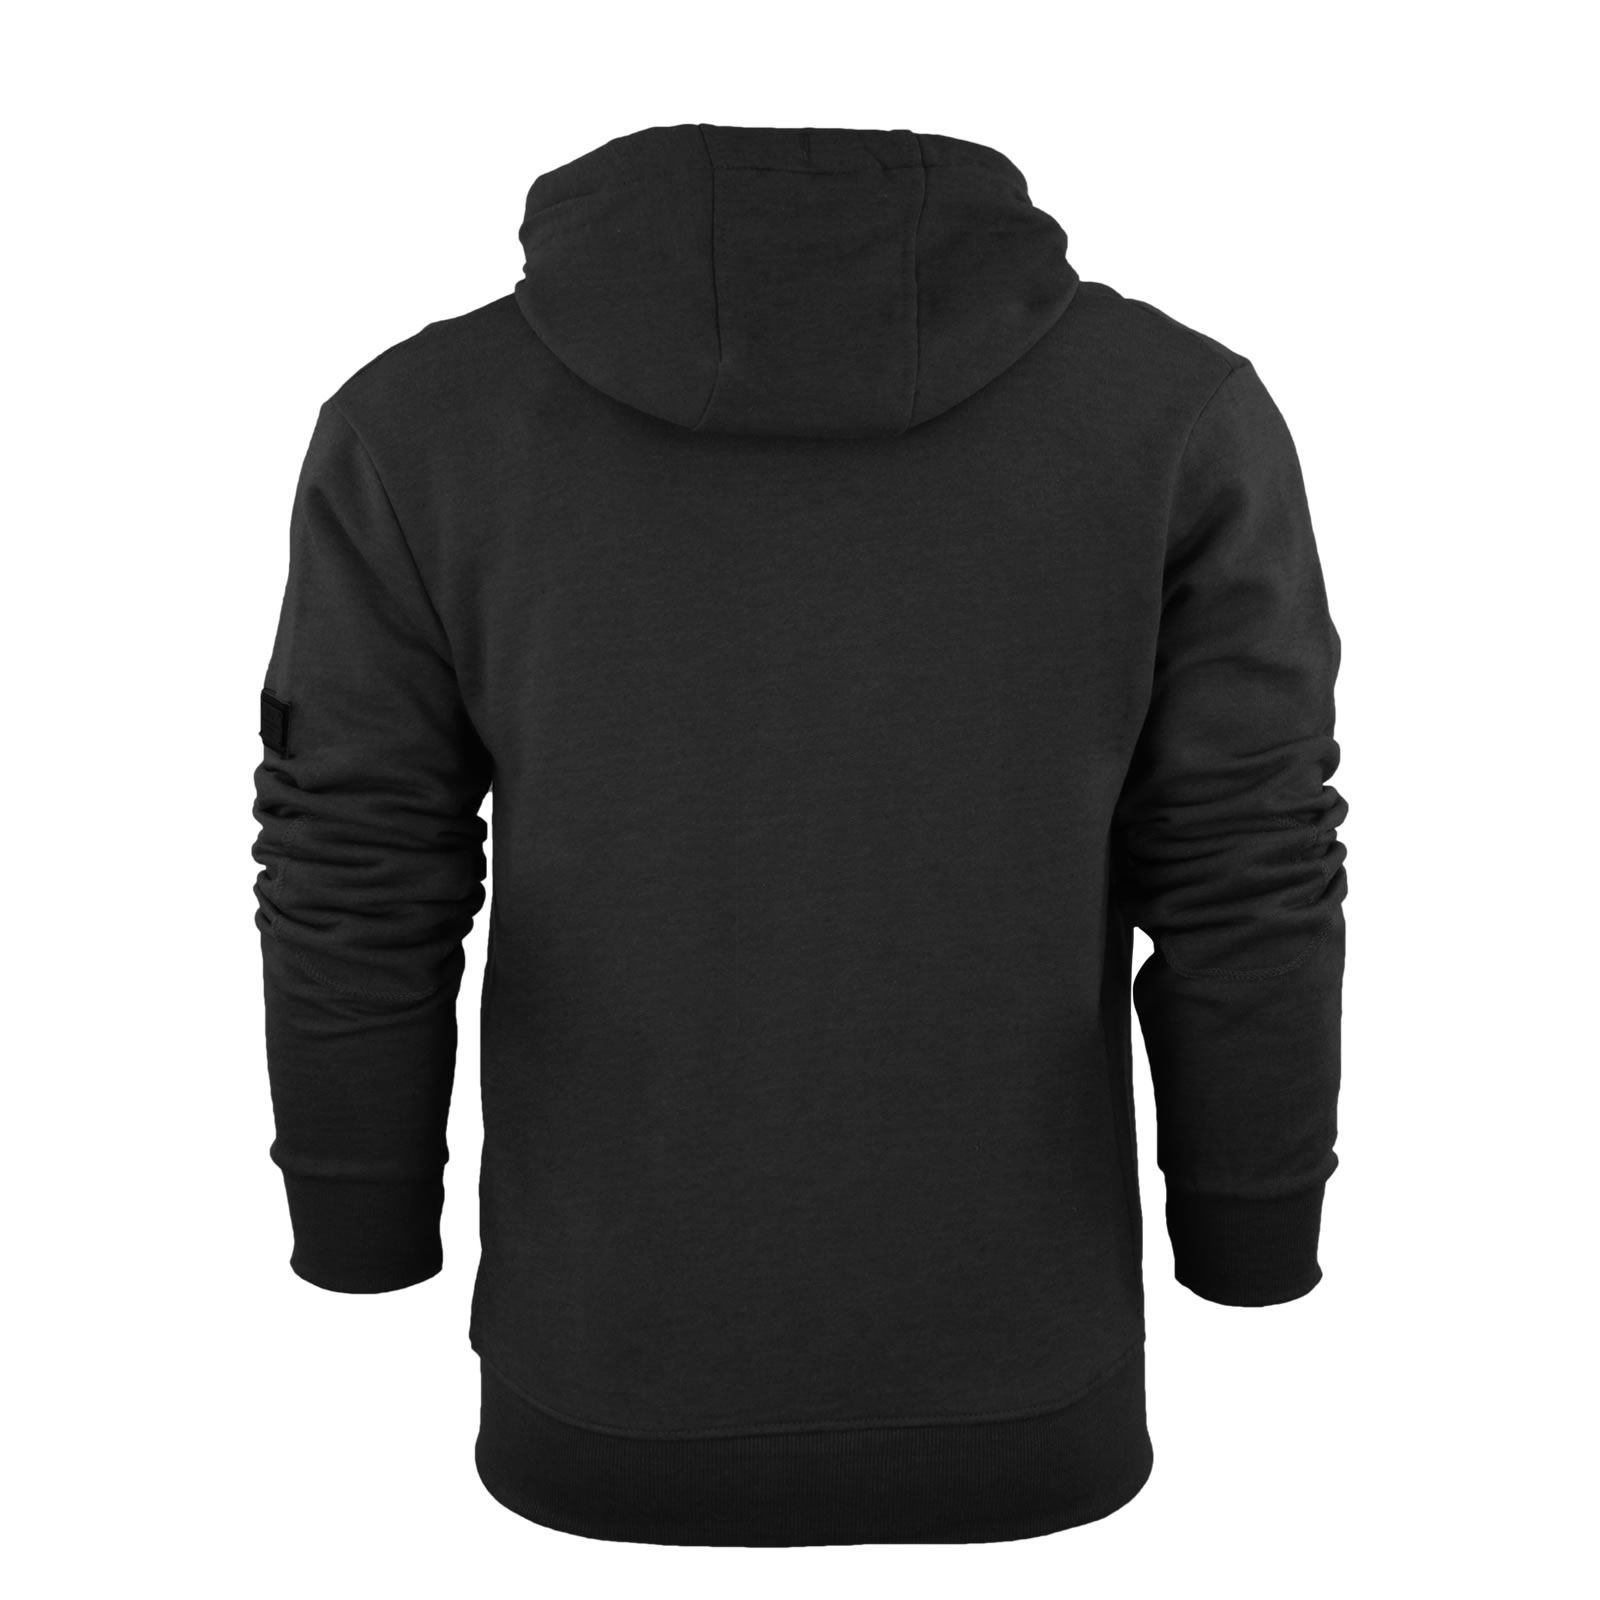 Mens-Hoodie-Smith-amp-Jones-Zip-Up-Hooded-Sweater-Jumper thumbnail 24